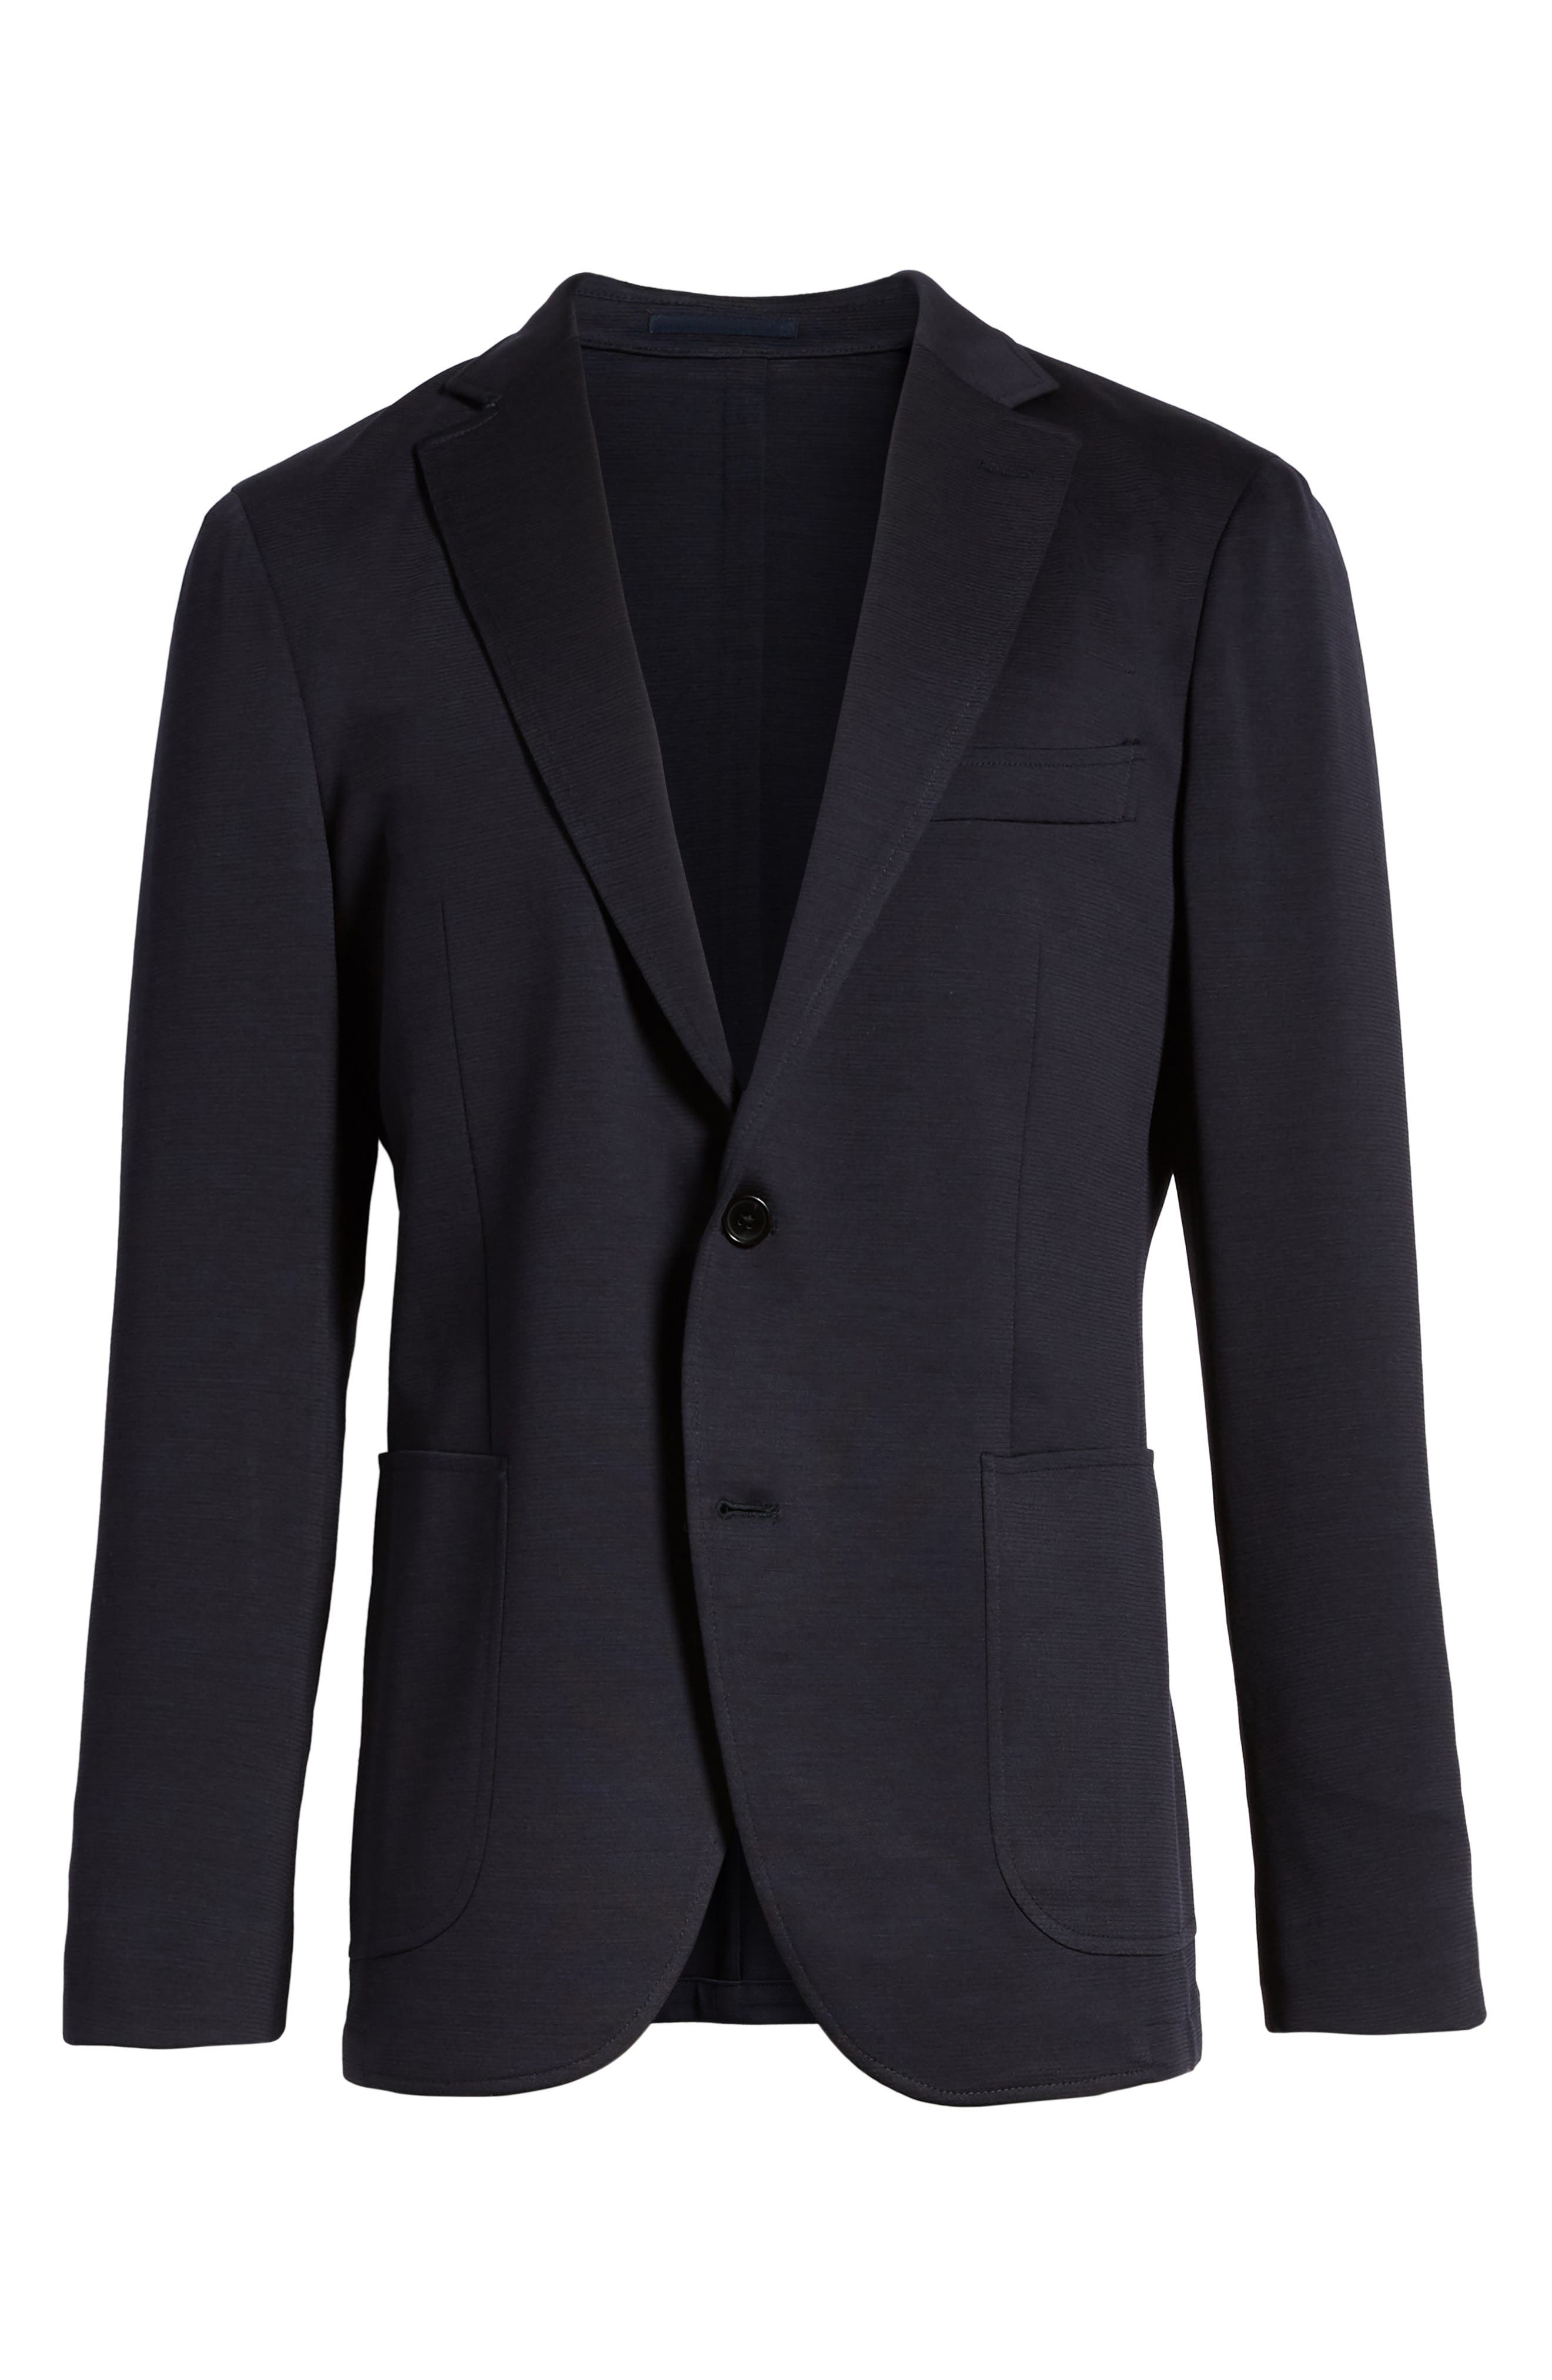 Cardrona Slim Fit Wool Blend Blazer,                             Alternate thumbnail 6, color,                             Navy